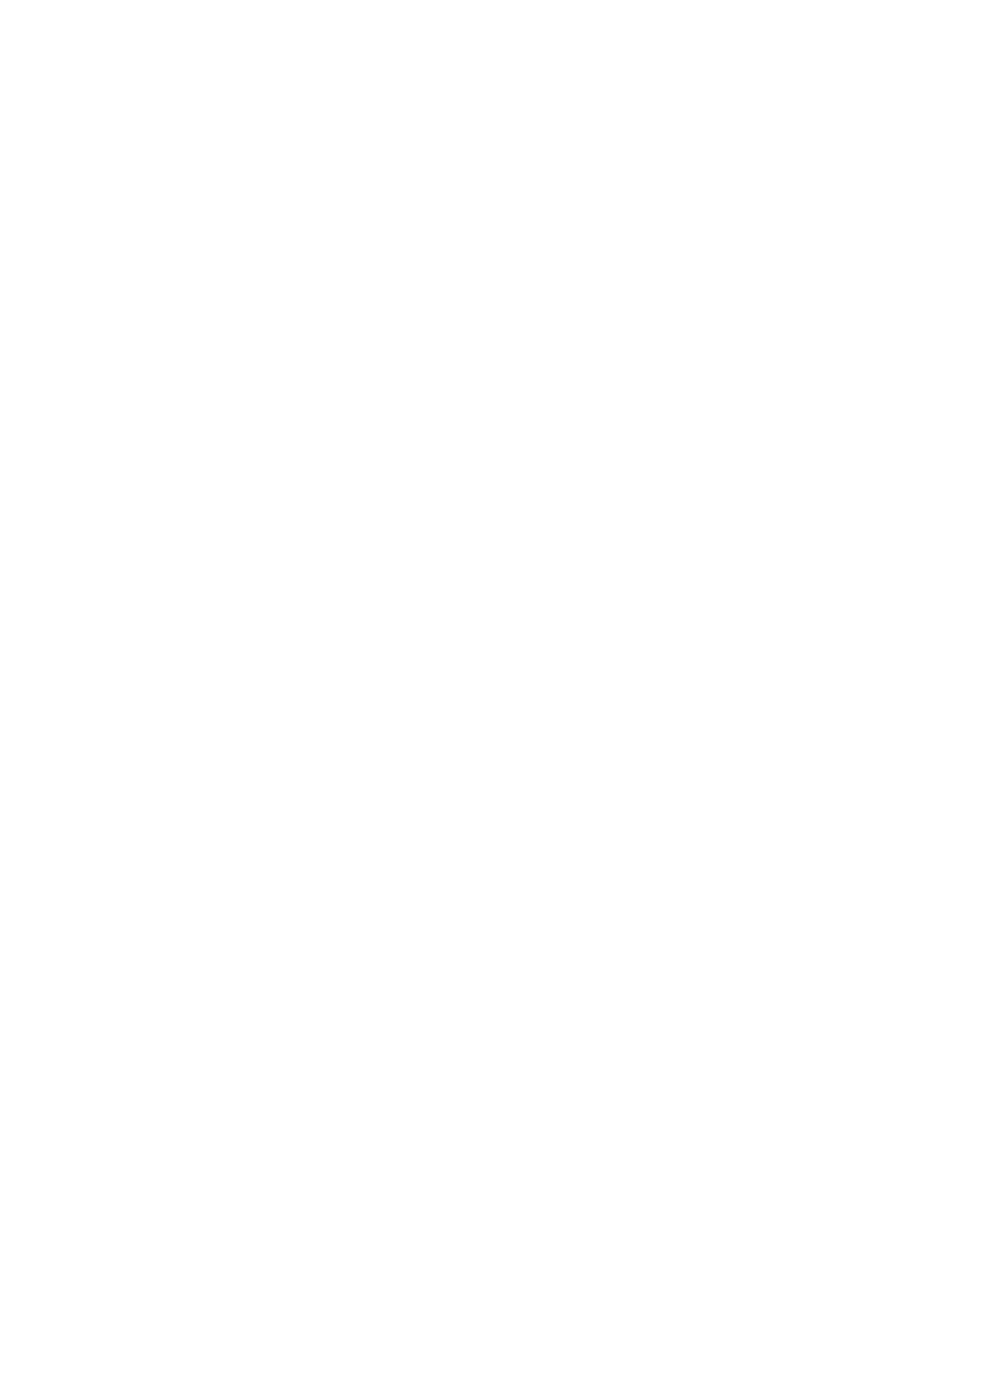 Eric Bell Designs Logo